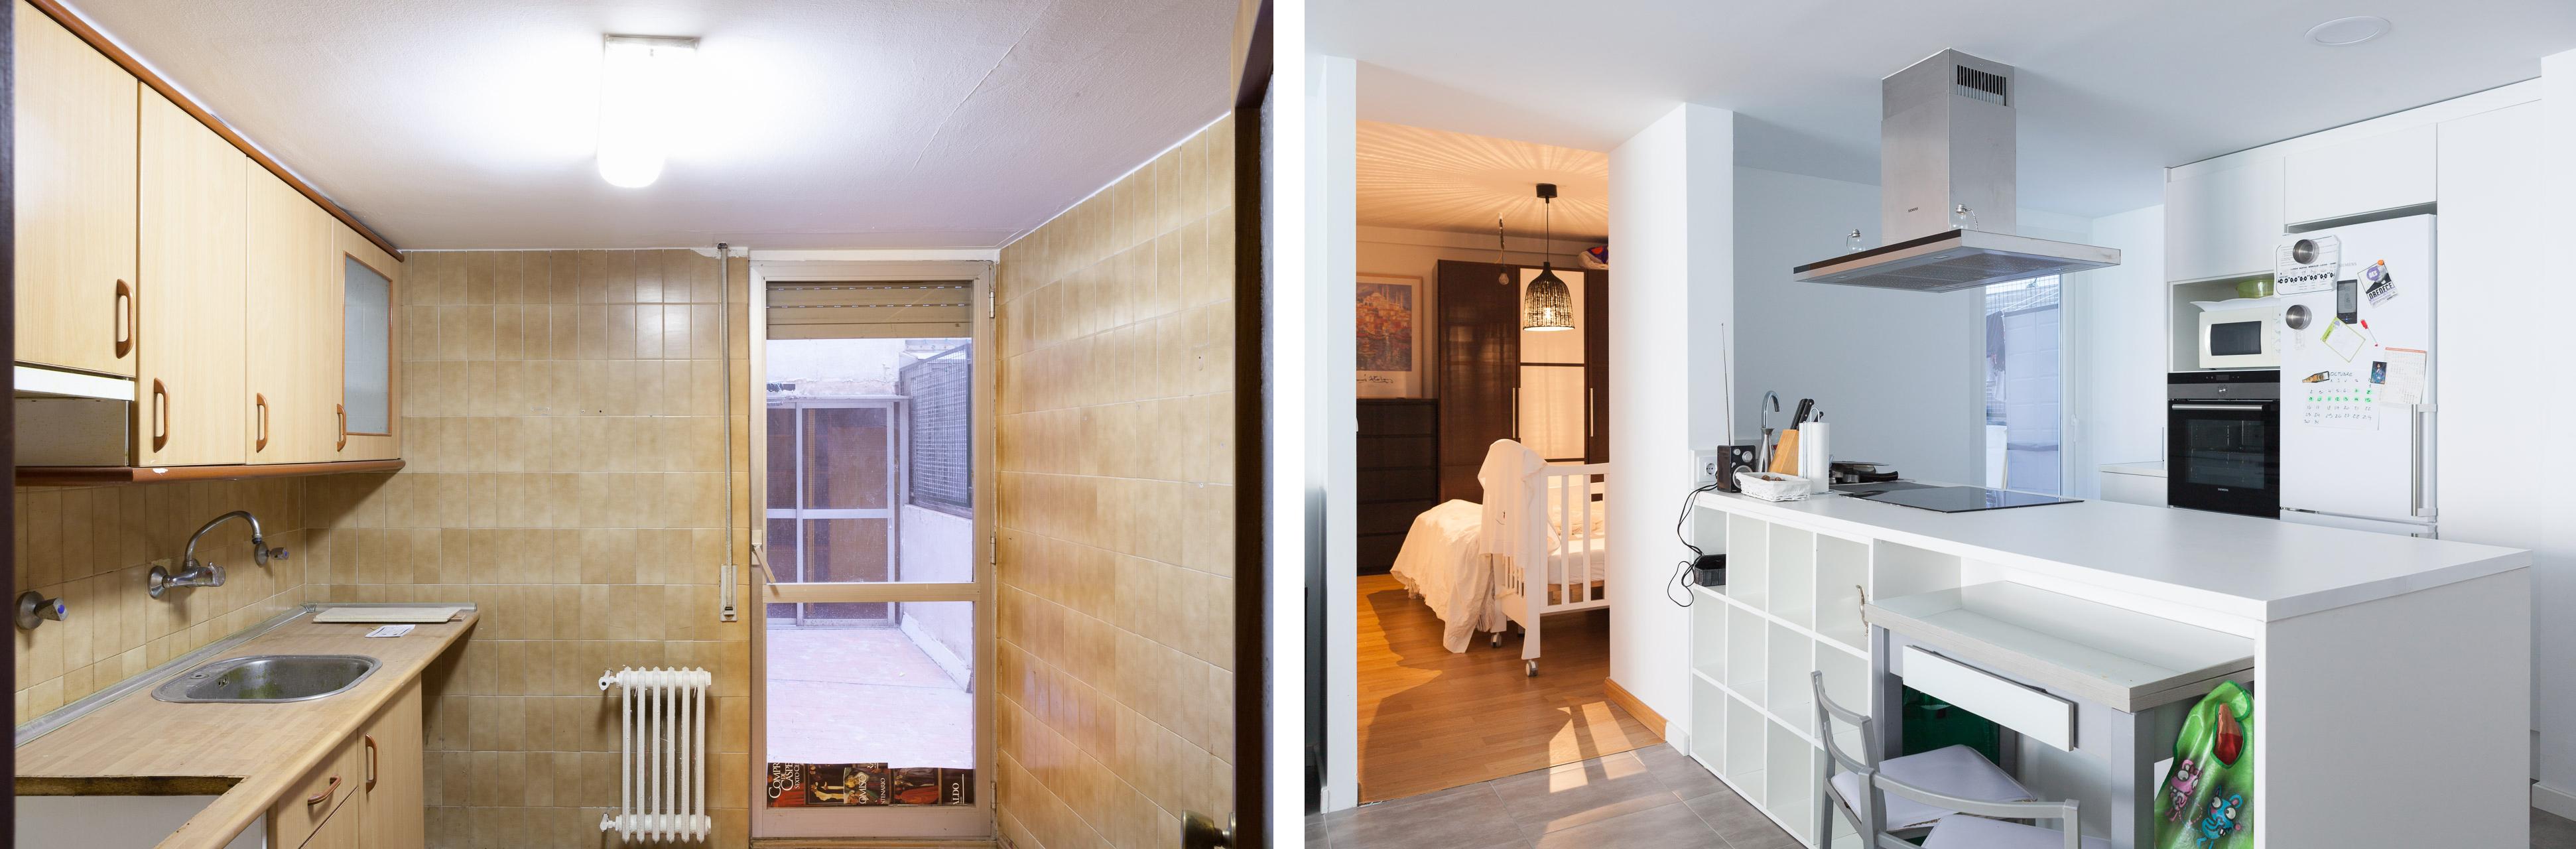 Reforma integral de vivienda en Zaragoza